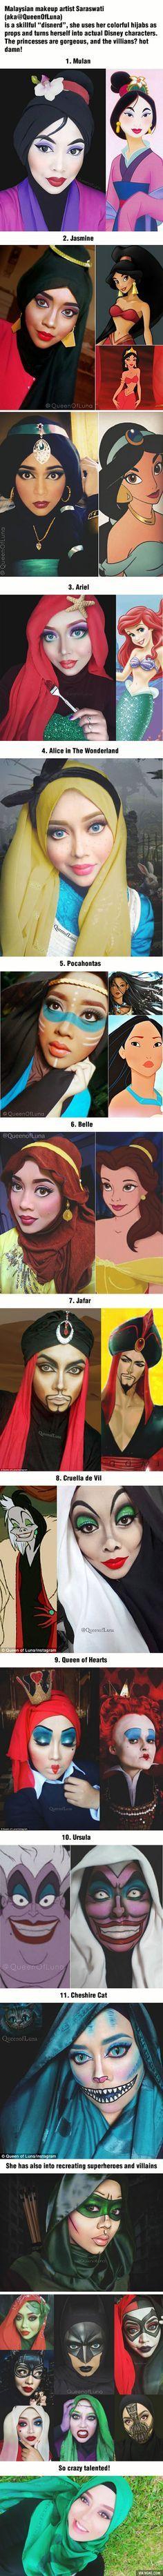 Malaysian Makeup Artist Transforms Into Stunning Disney Characters Using Her Hijab Halloween 🎃 Disney And Dreamworks, Disney Pixar, Walt Disney, Disney Characters, Superhero Characters, Disney Love, Disney Magic, Disney Art, Disney Halloween